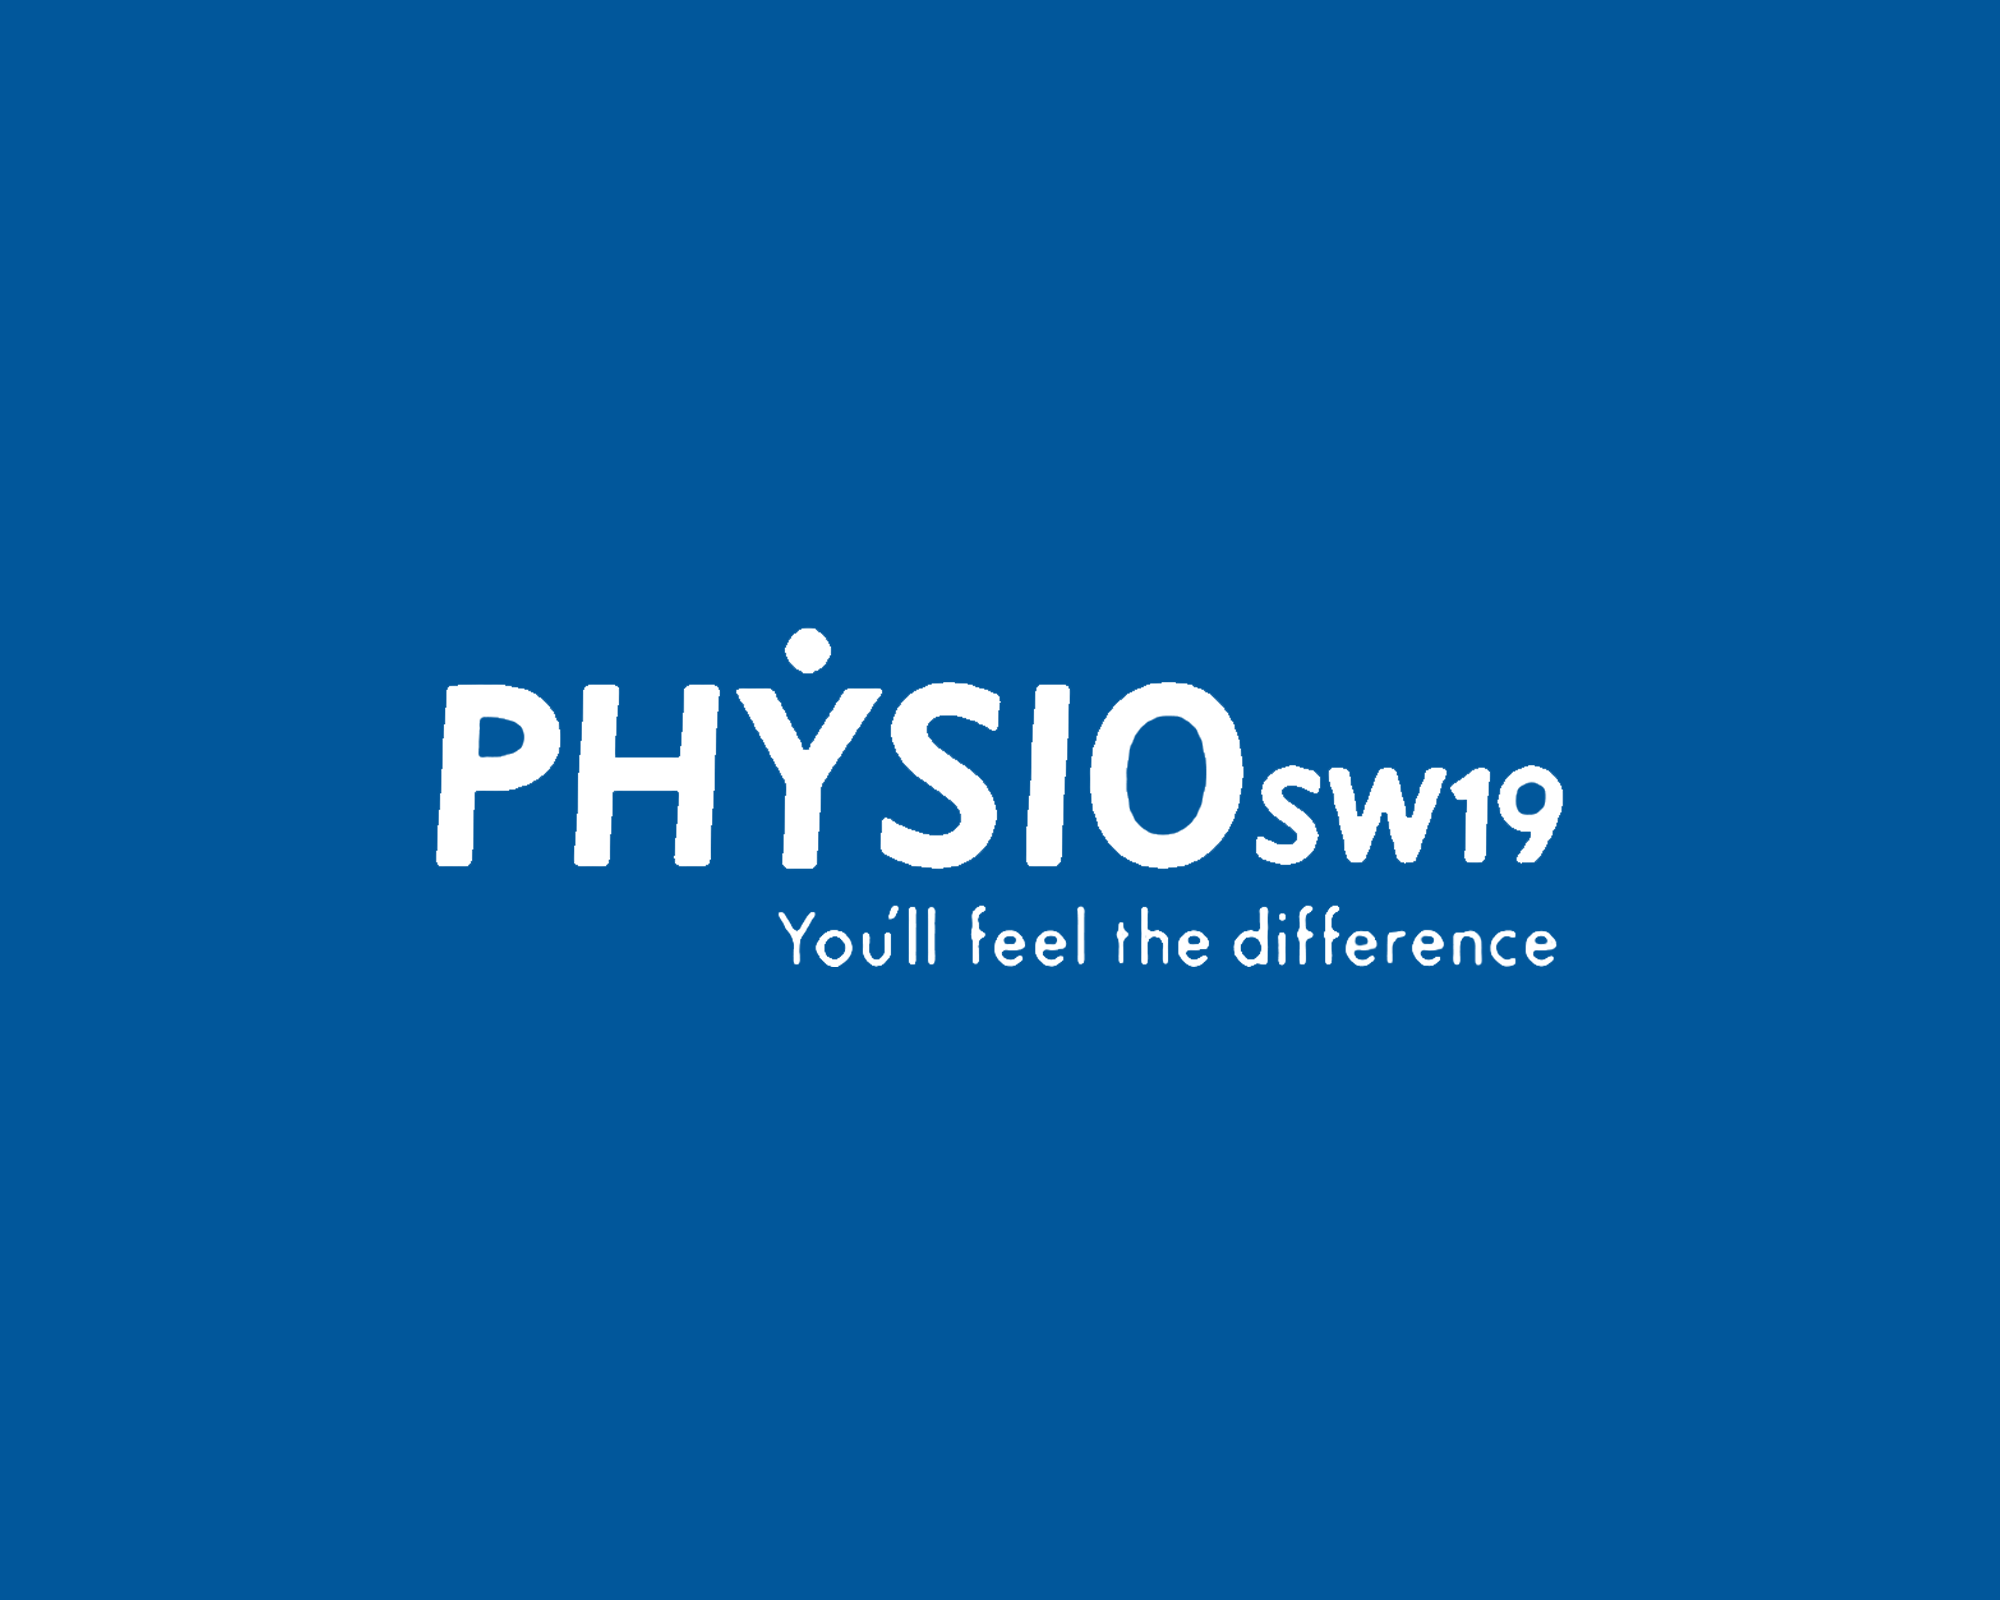 physiosw19 Logo